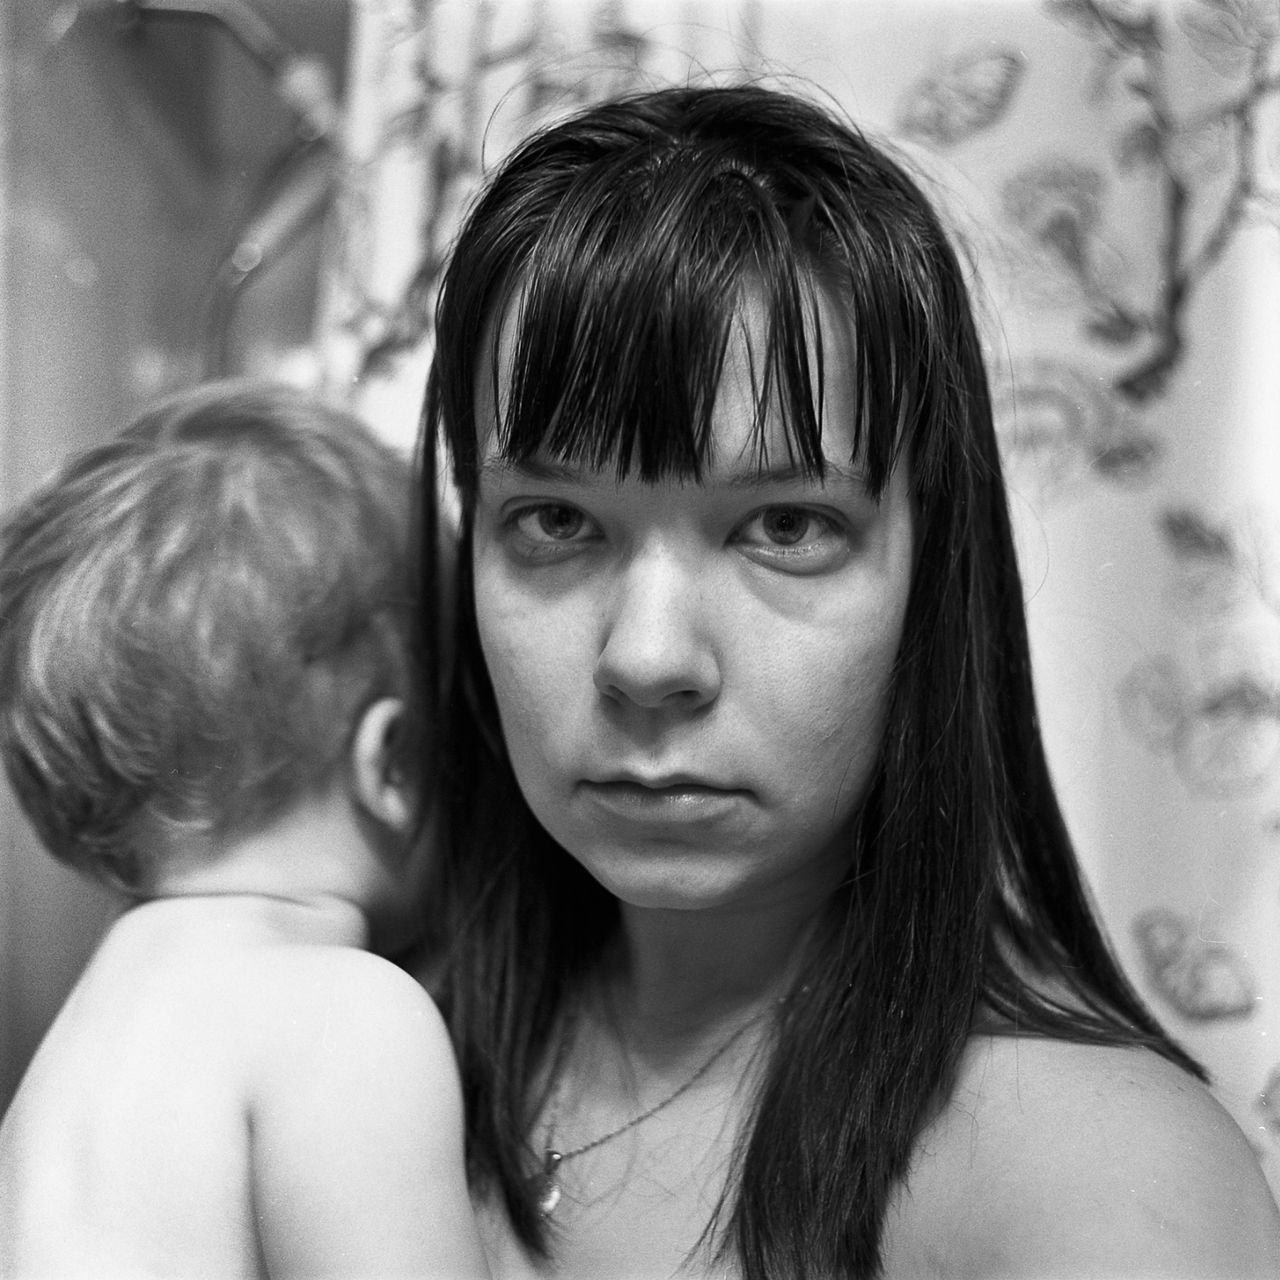 Sarah Ann Austin, Self with Child in Bathroom